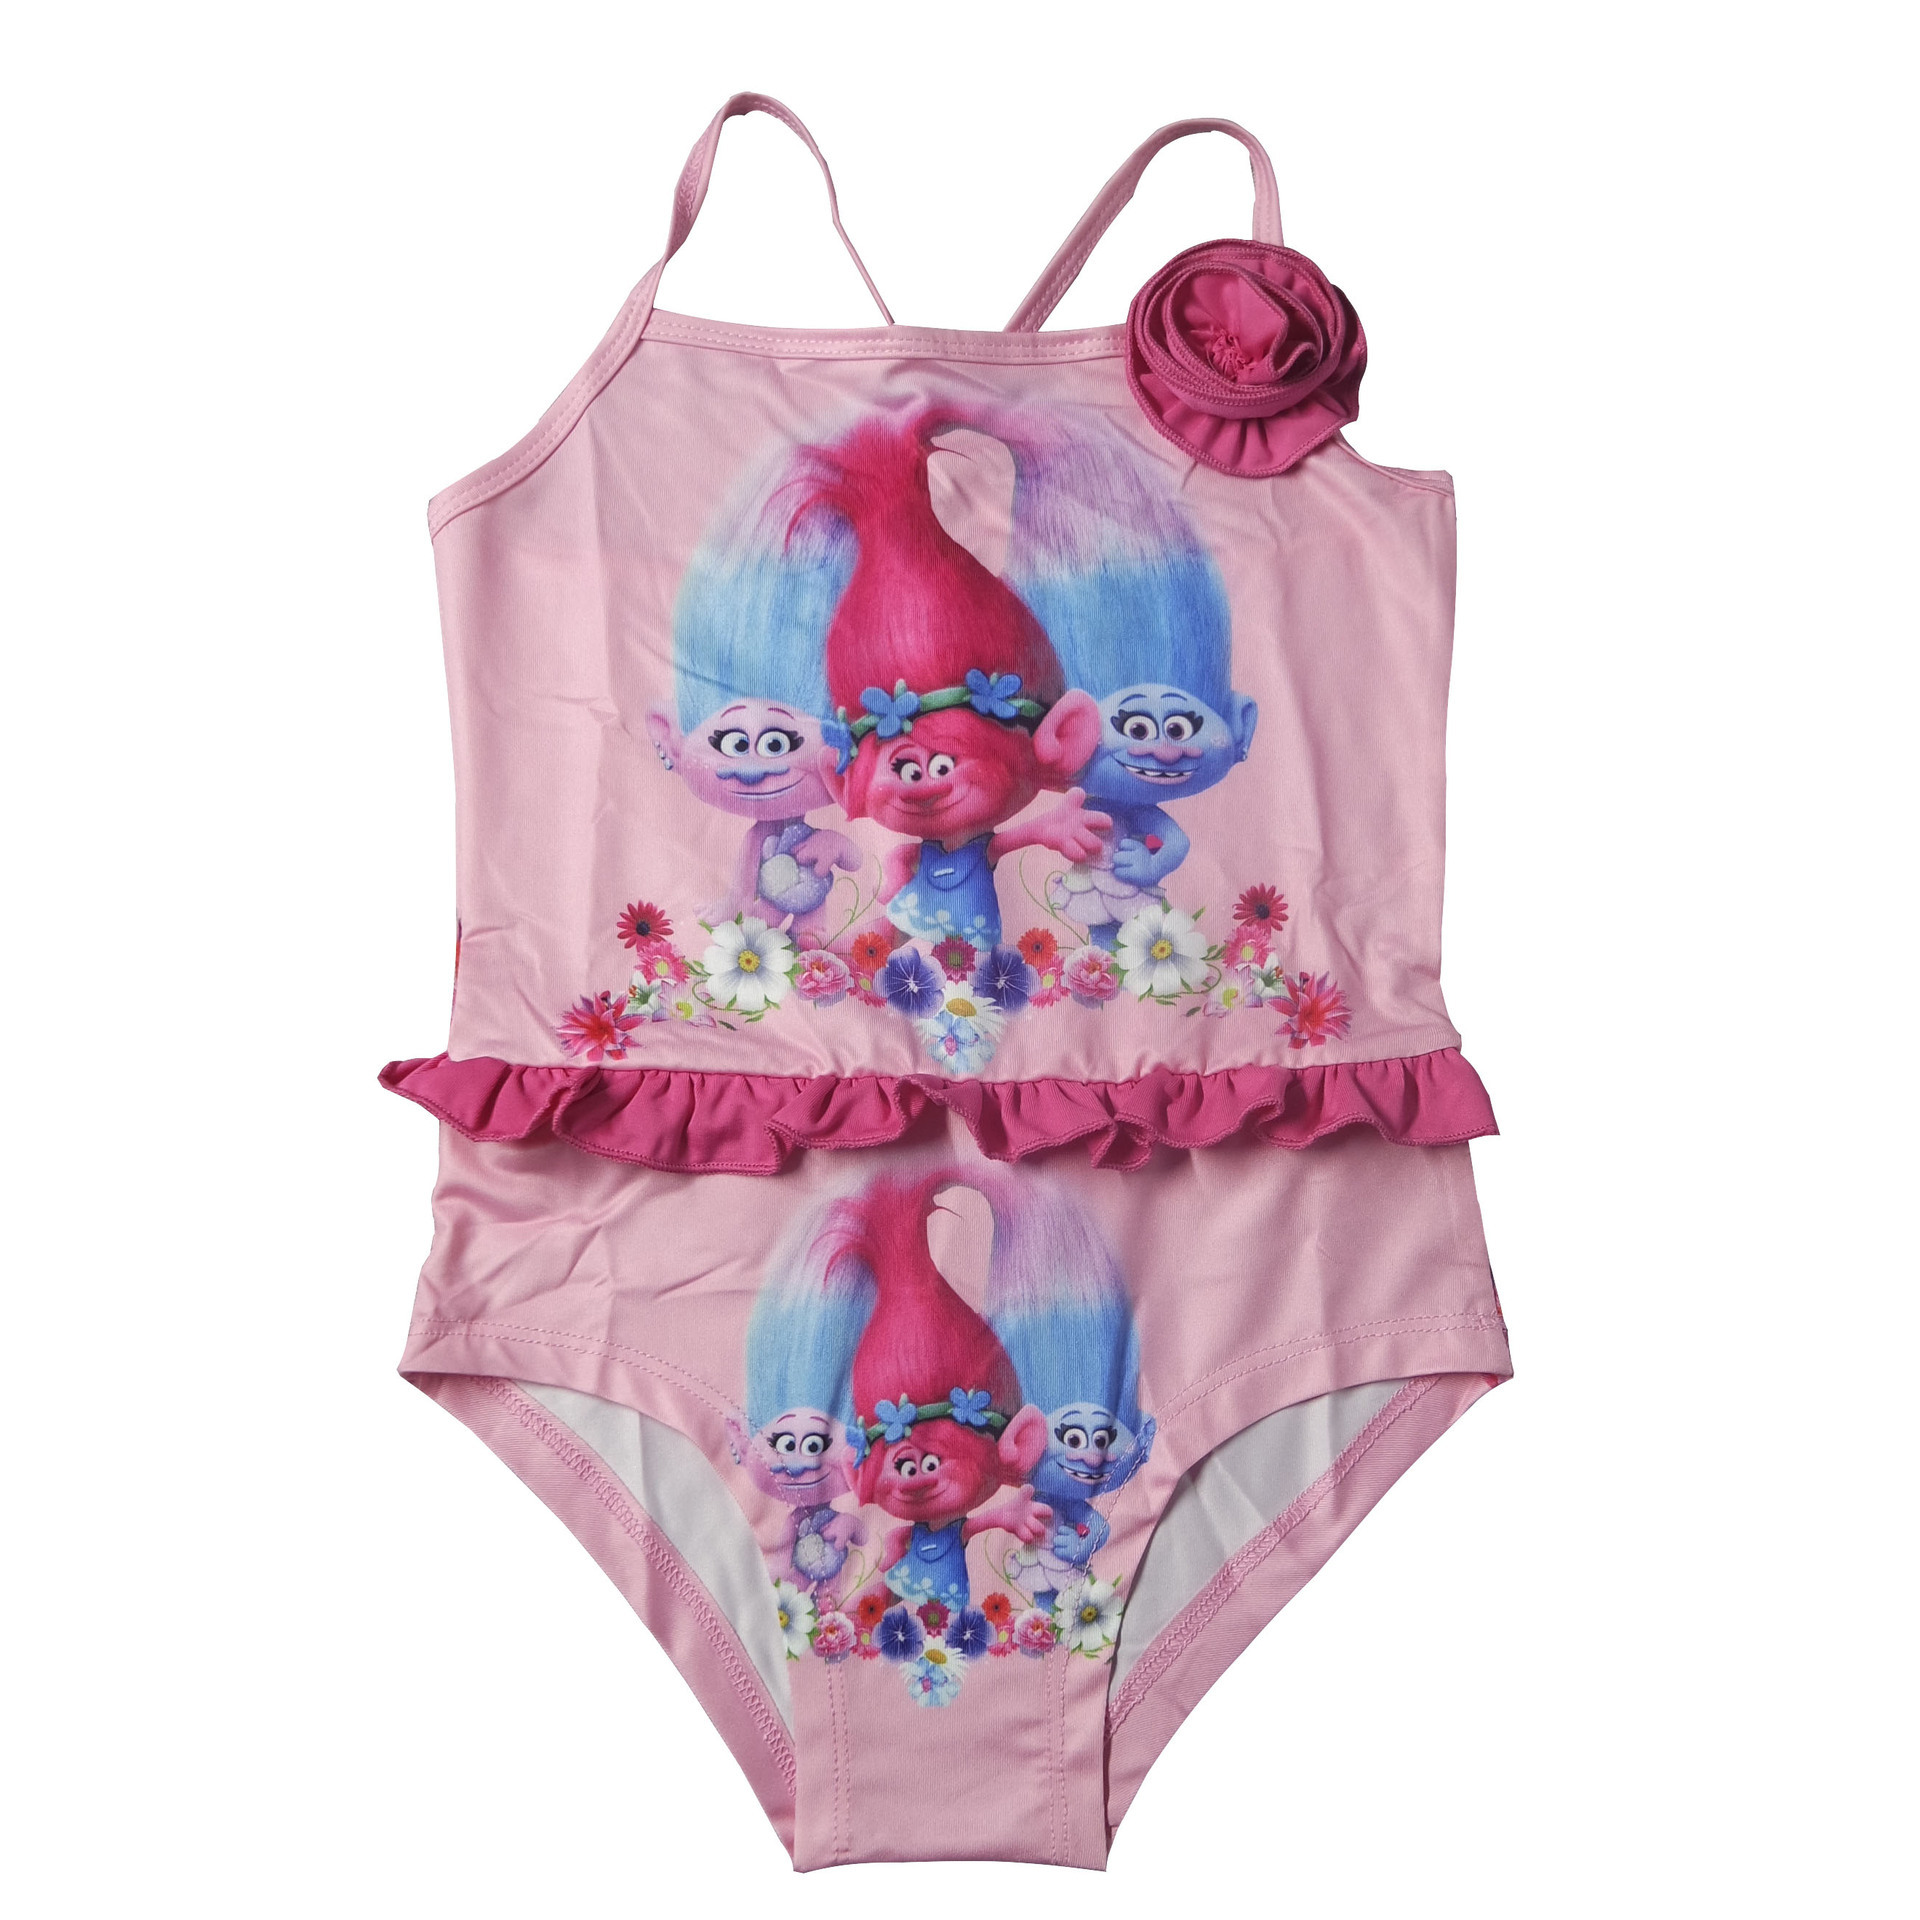 2017 Magic Elf Europe And America Bikini Backless Children One-piece Cartoon Swimwear Girls Beach Bathing Suit 1608